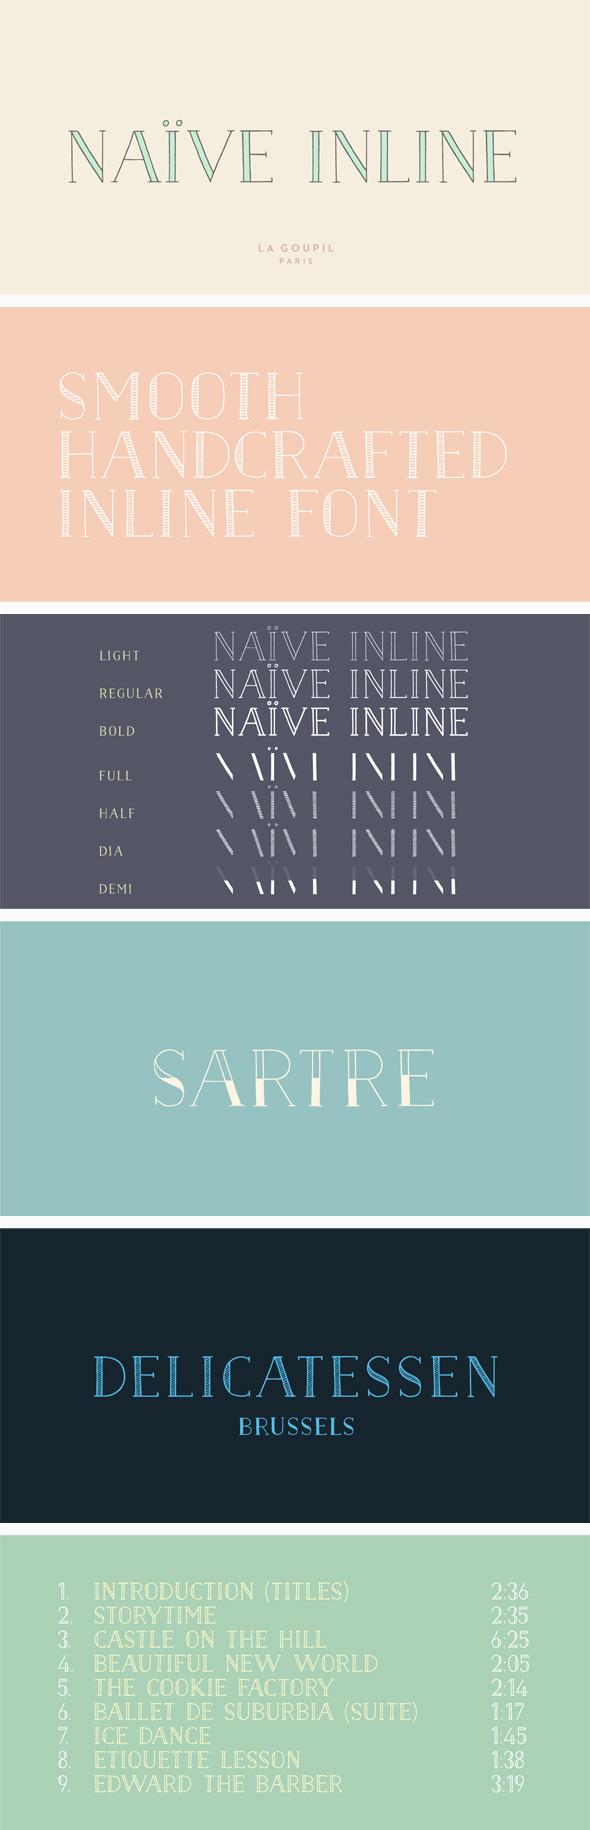 Download Naive Inline Font Pack | Font packs, Naive, Fonts